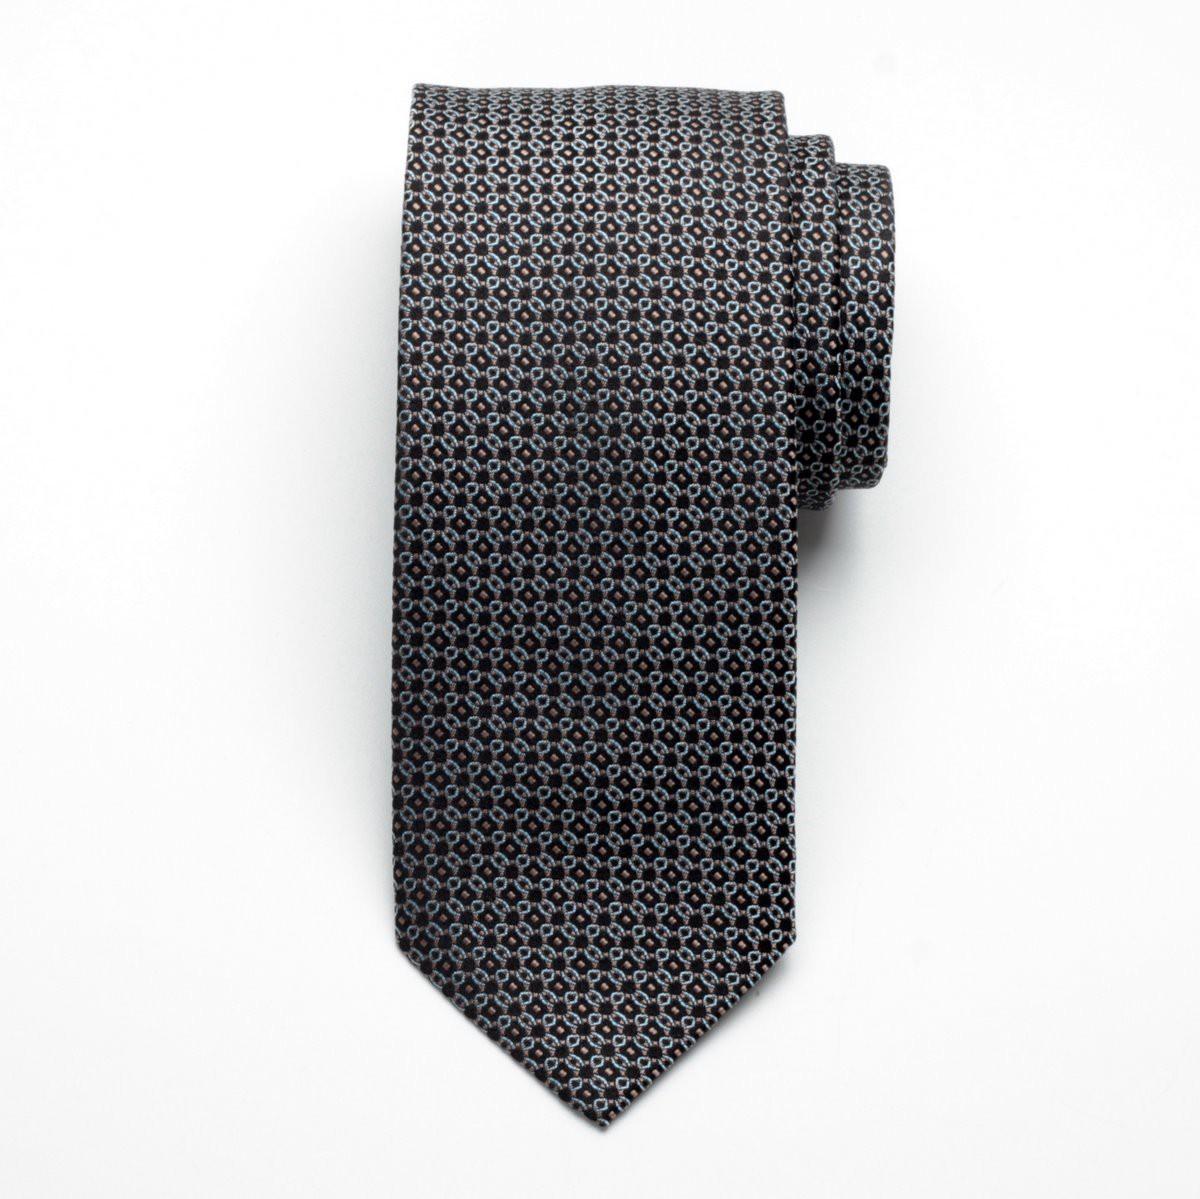 Krawat jedwabny Fine Selection (wzór 88)